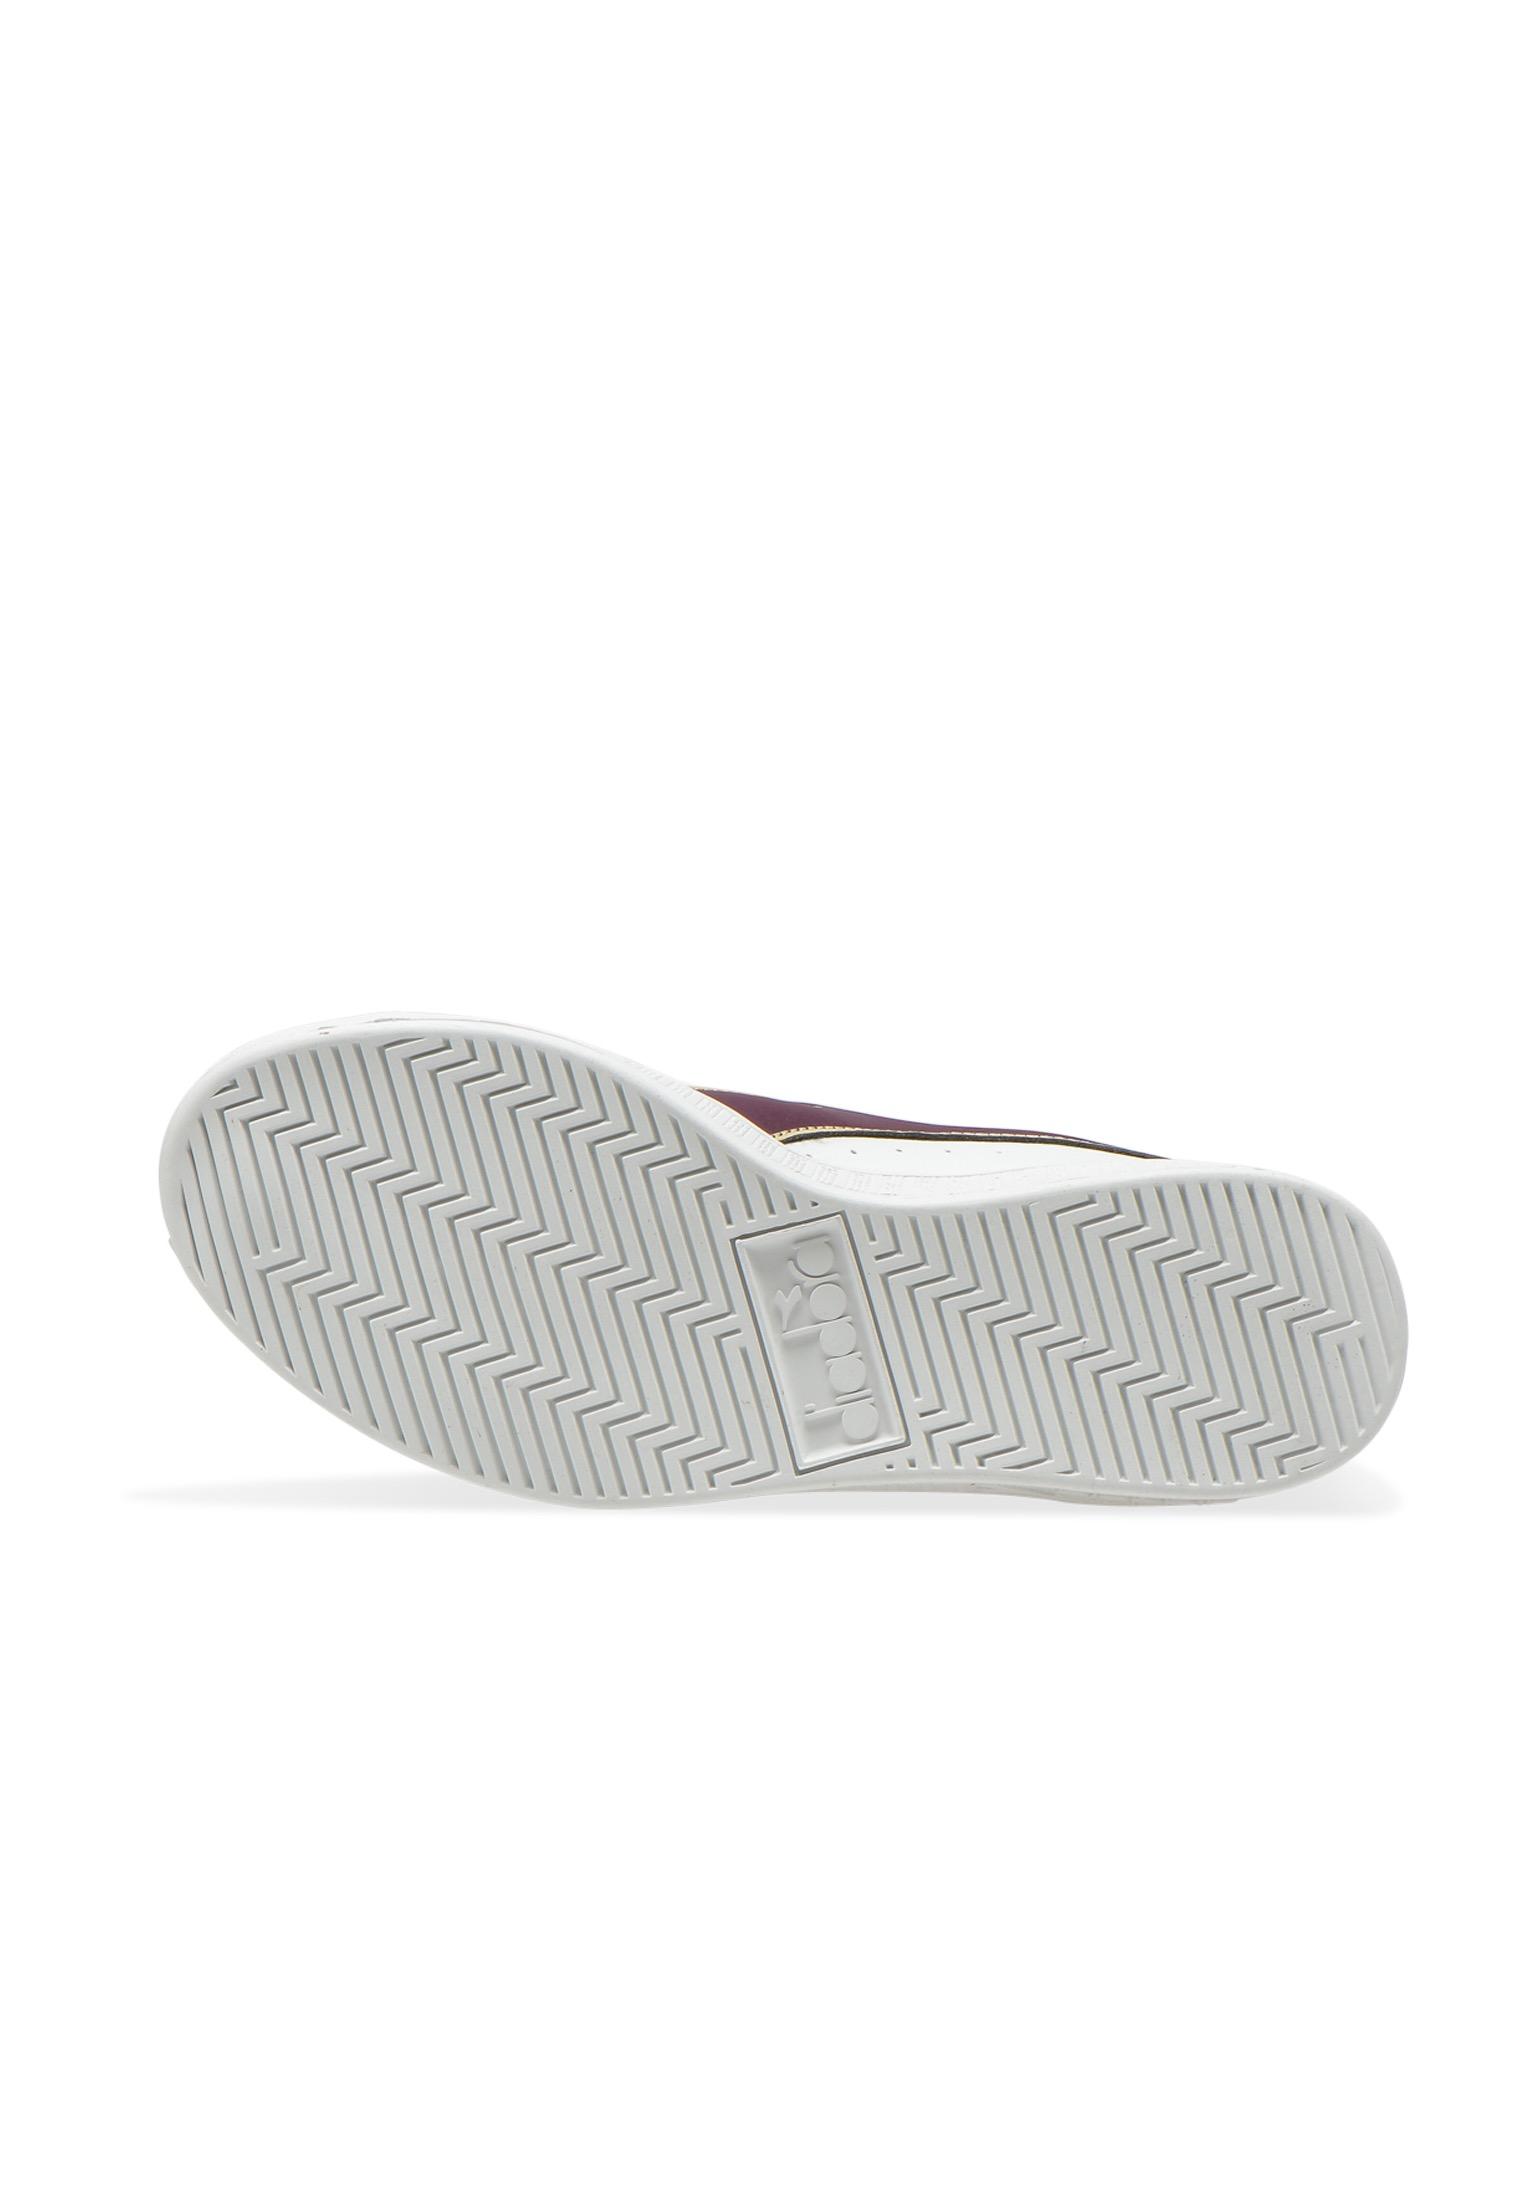 Diadora-Sneakers-GAME-P-WN-para-hombre-y-mujer miniatura 34